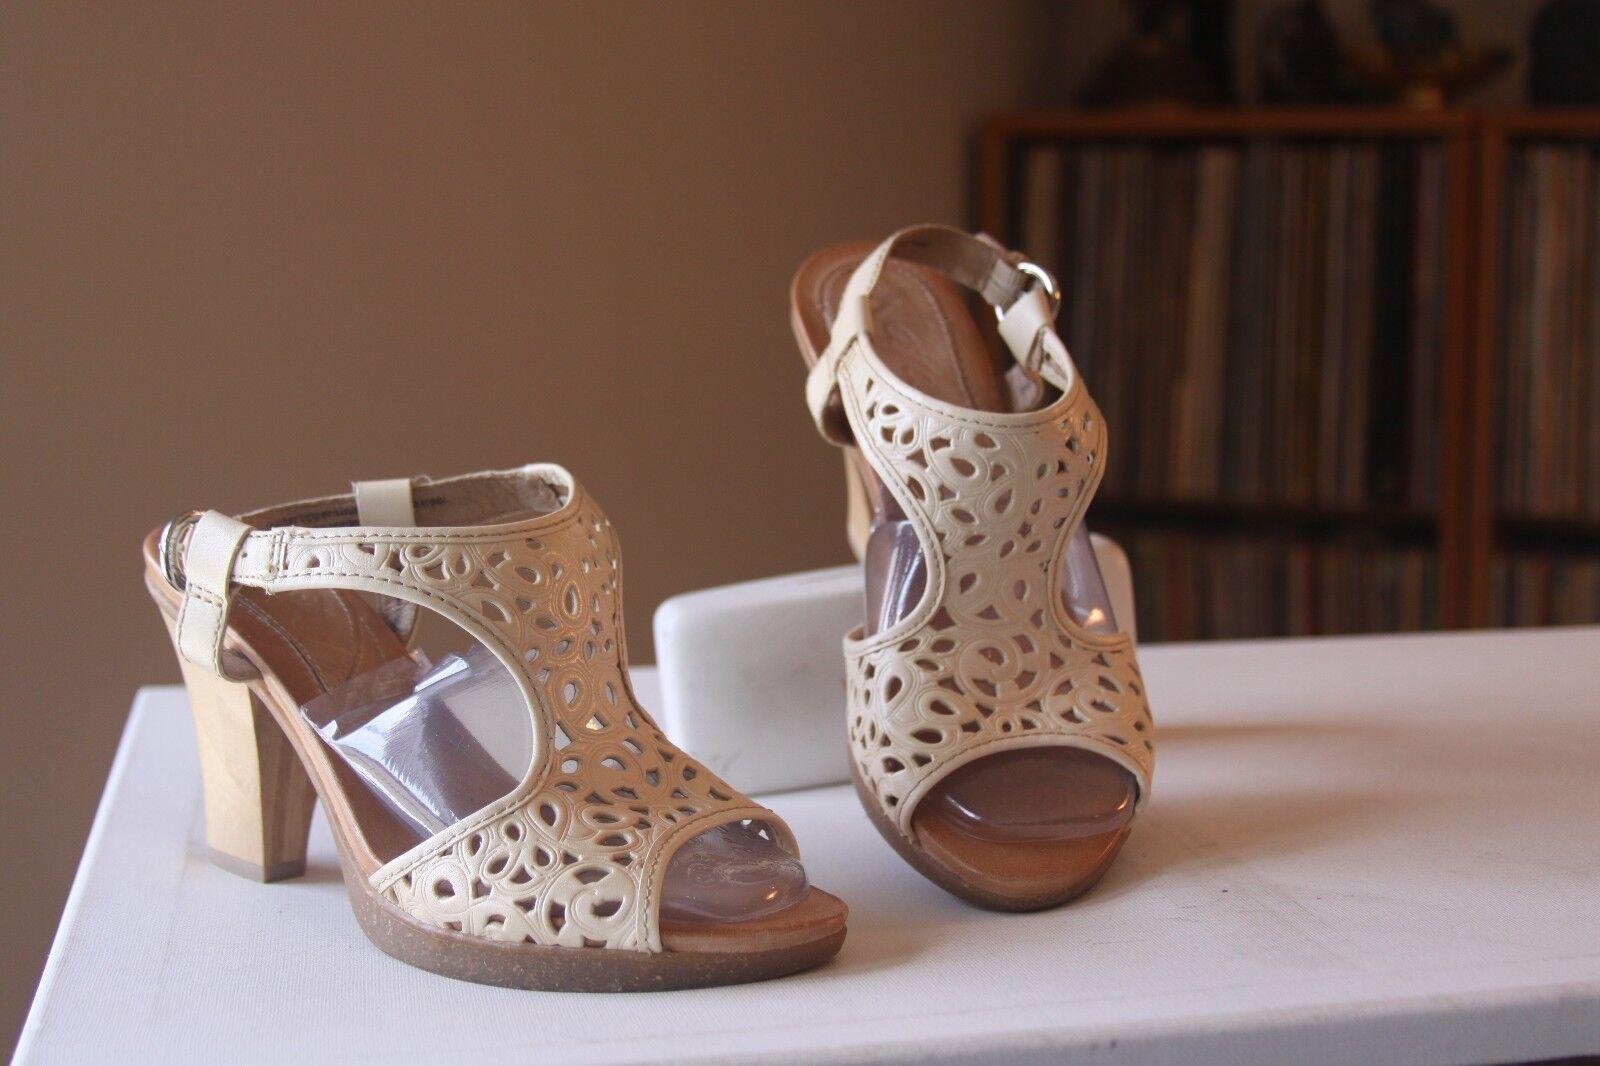 Naya Alpine Beige Leather 3.5 Inch Bamboo Heel Slingbacks Sandals Size 7 Medium